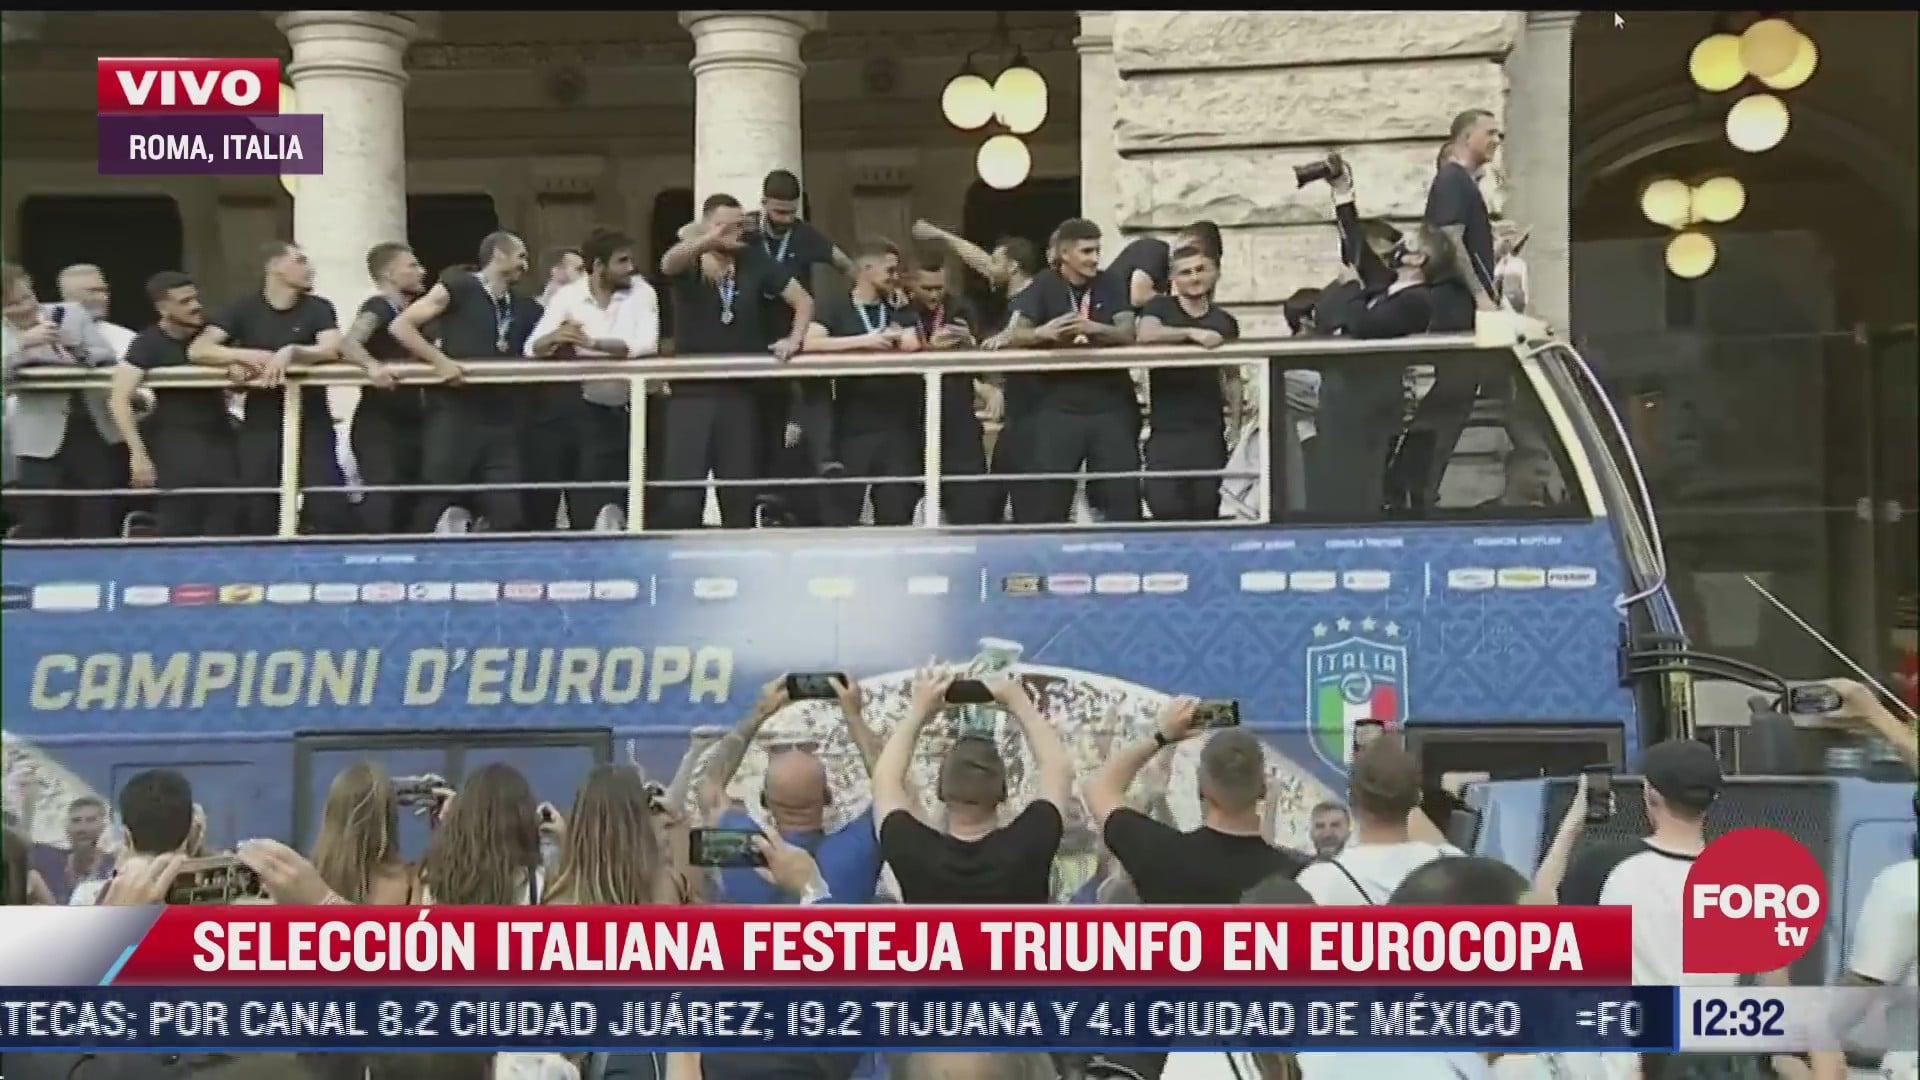 seleccion de italia celebra triunfo de la eurocopa y calles de roma lucen abarrotadas